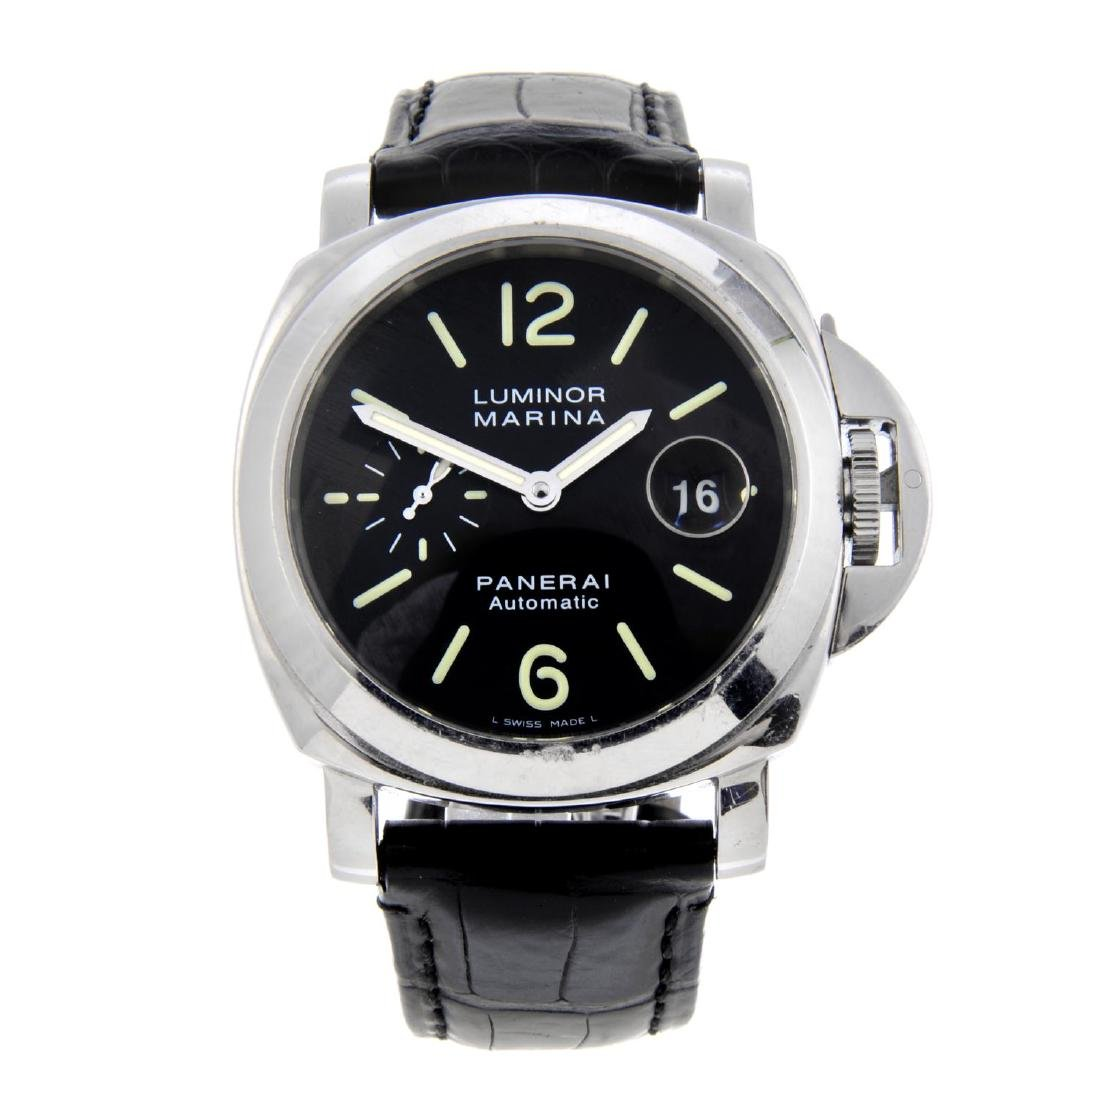 PANERAI - a gentleman's Luminor Marina wrist watch.